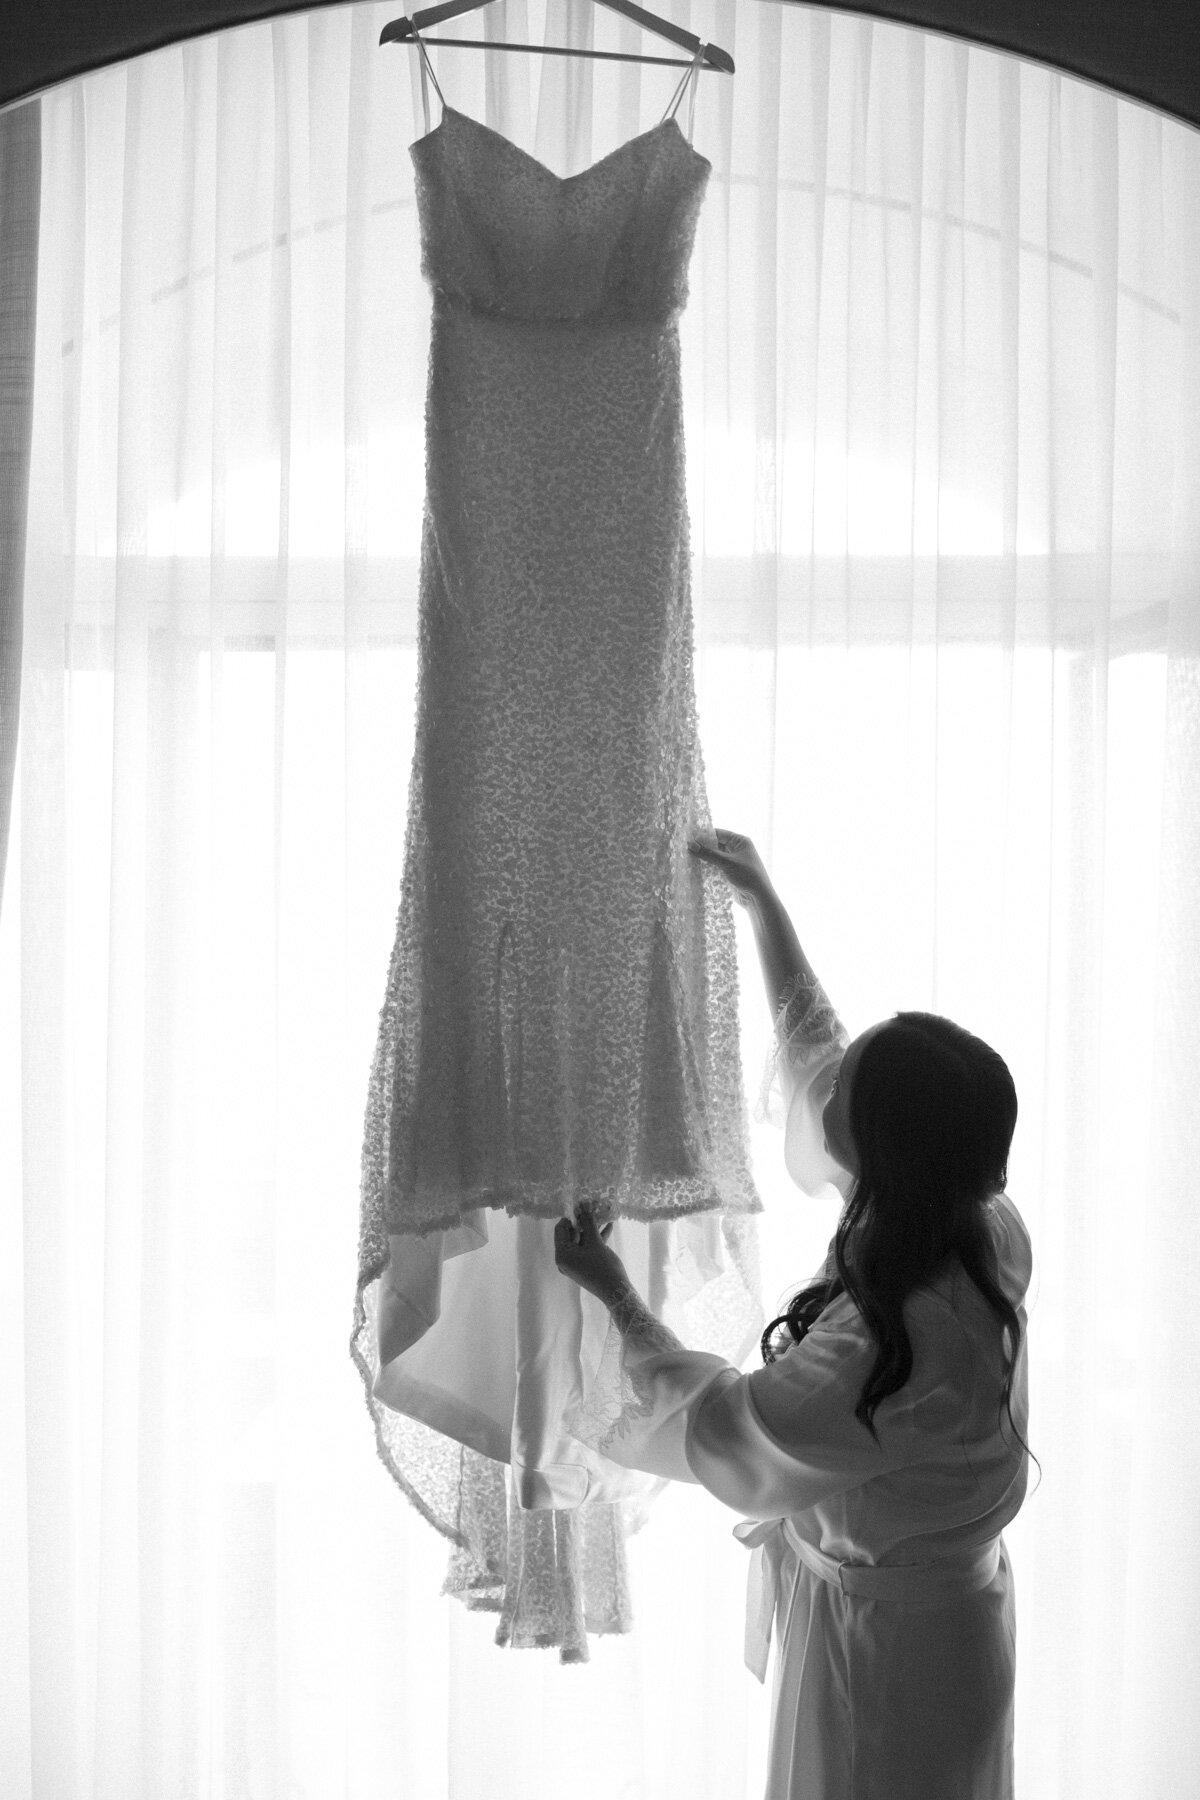 Belmond-Hotel-Caruso-ravello-elopement-Katie-Grant-destination-wedding (14 of 50).jpg